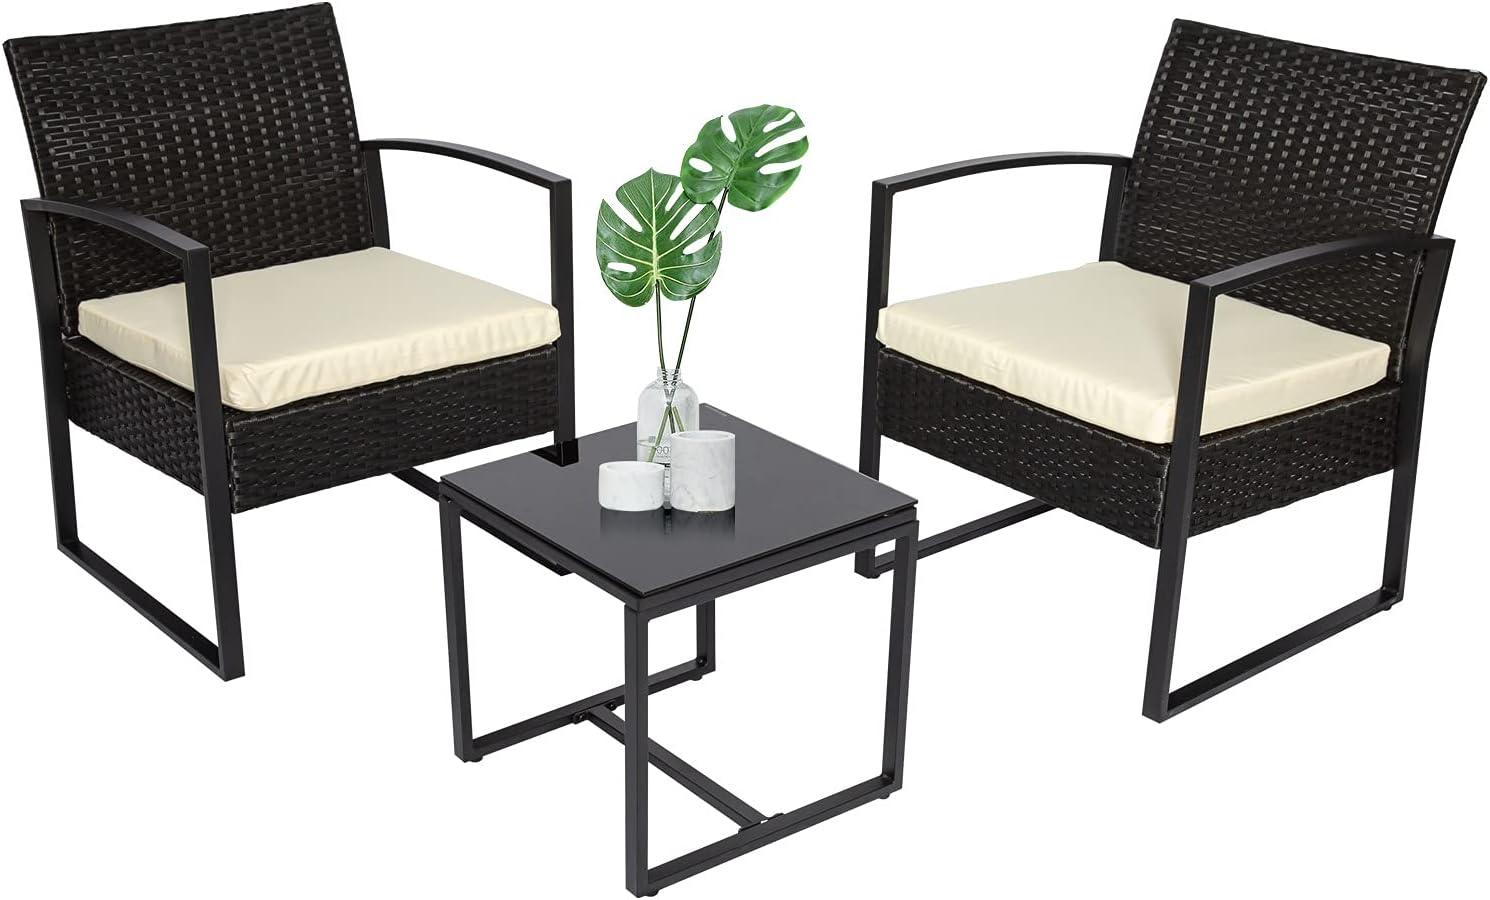 3 Pieces Bistro Kansas City Mall Set Genuine Patio Modern Furniture Rattan Chair Conversa